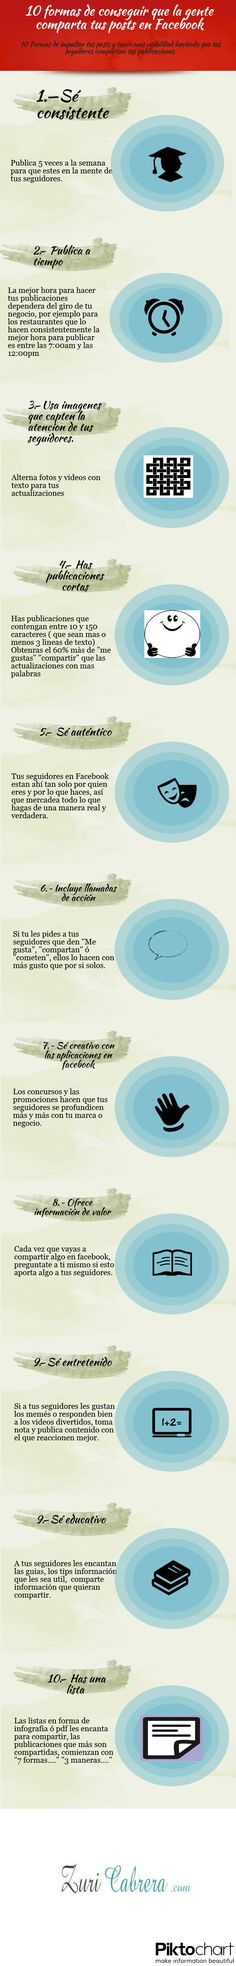 10 formas de que compartan tus posts de #FaceBook. #infografia #socialmedia